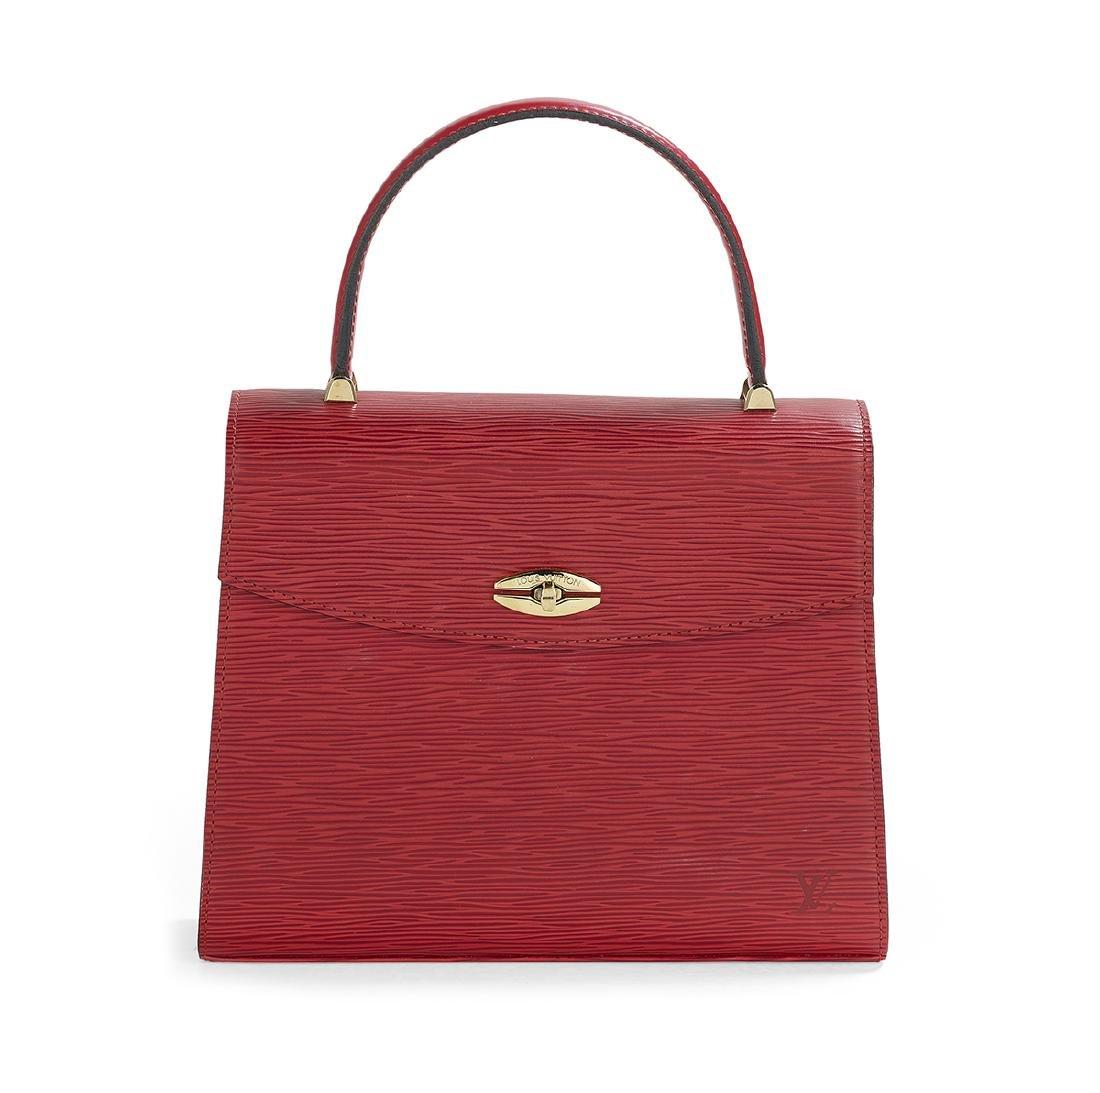 "Louis Vuitton Epi Leather ""Malesherbes"" Handbag"